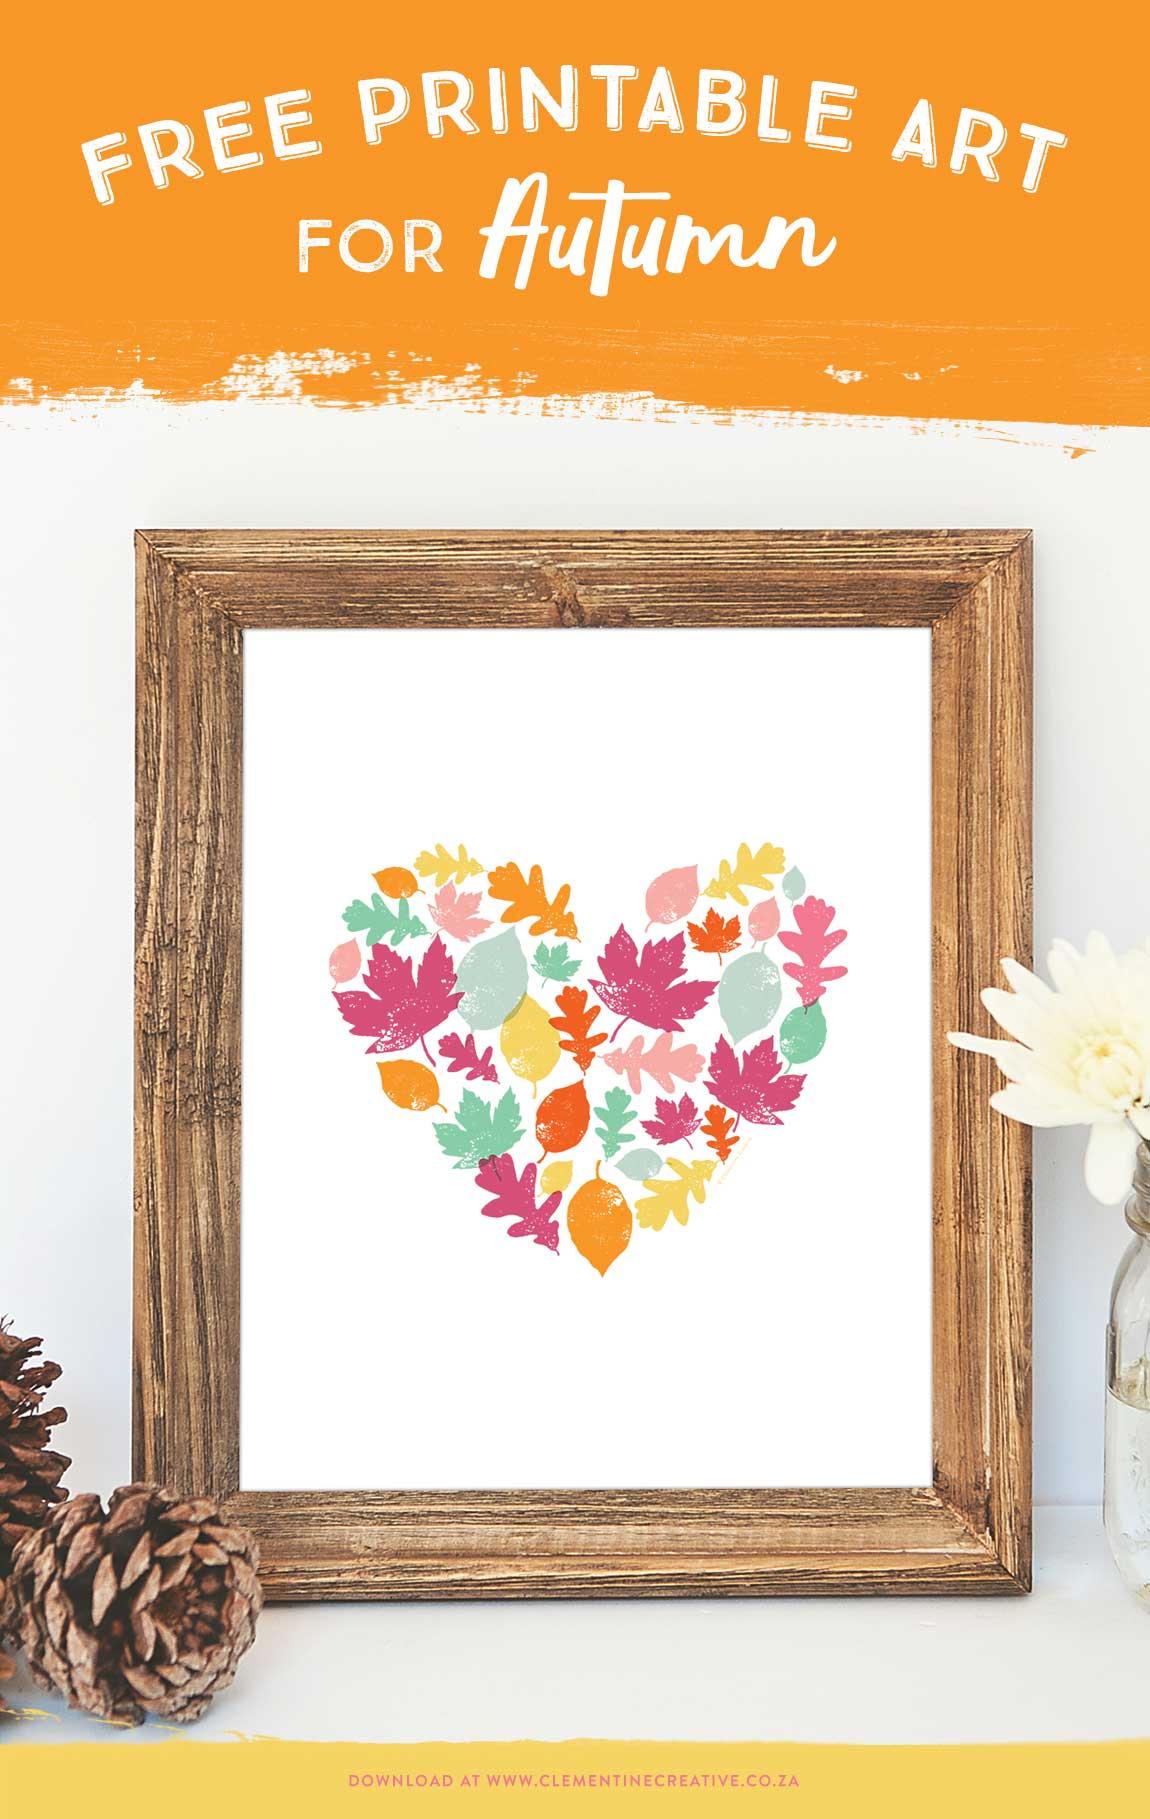 Autumn Leaves Art Print - Free Printable Art For Your Home - Free Printable Artwork For Home